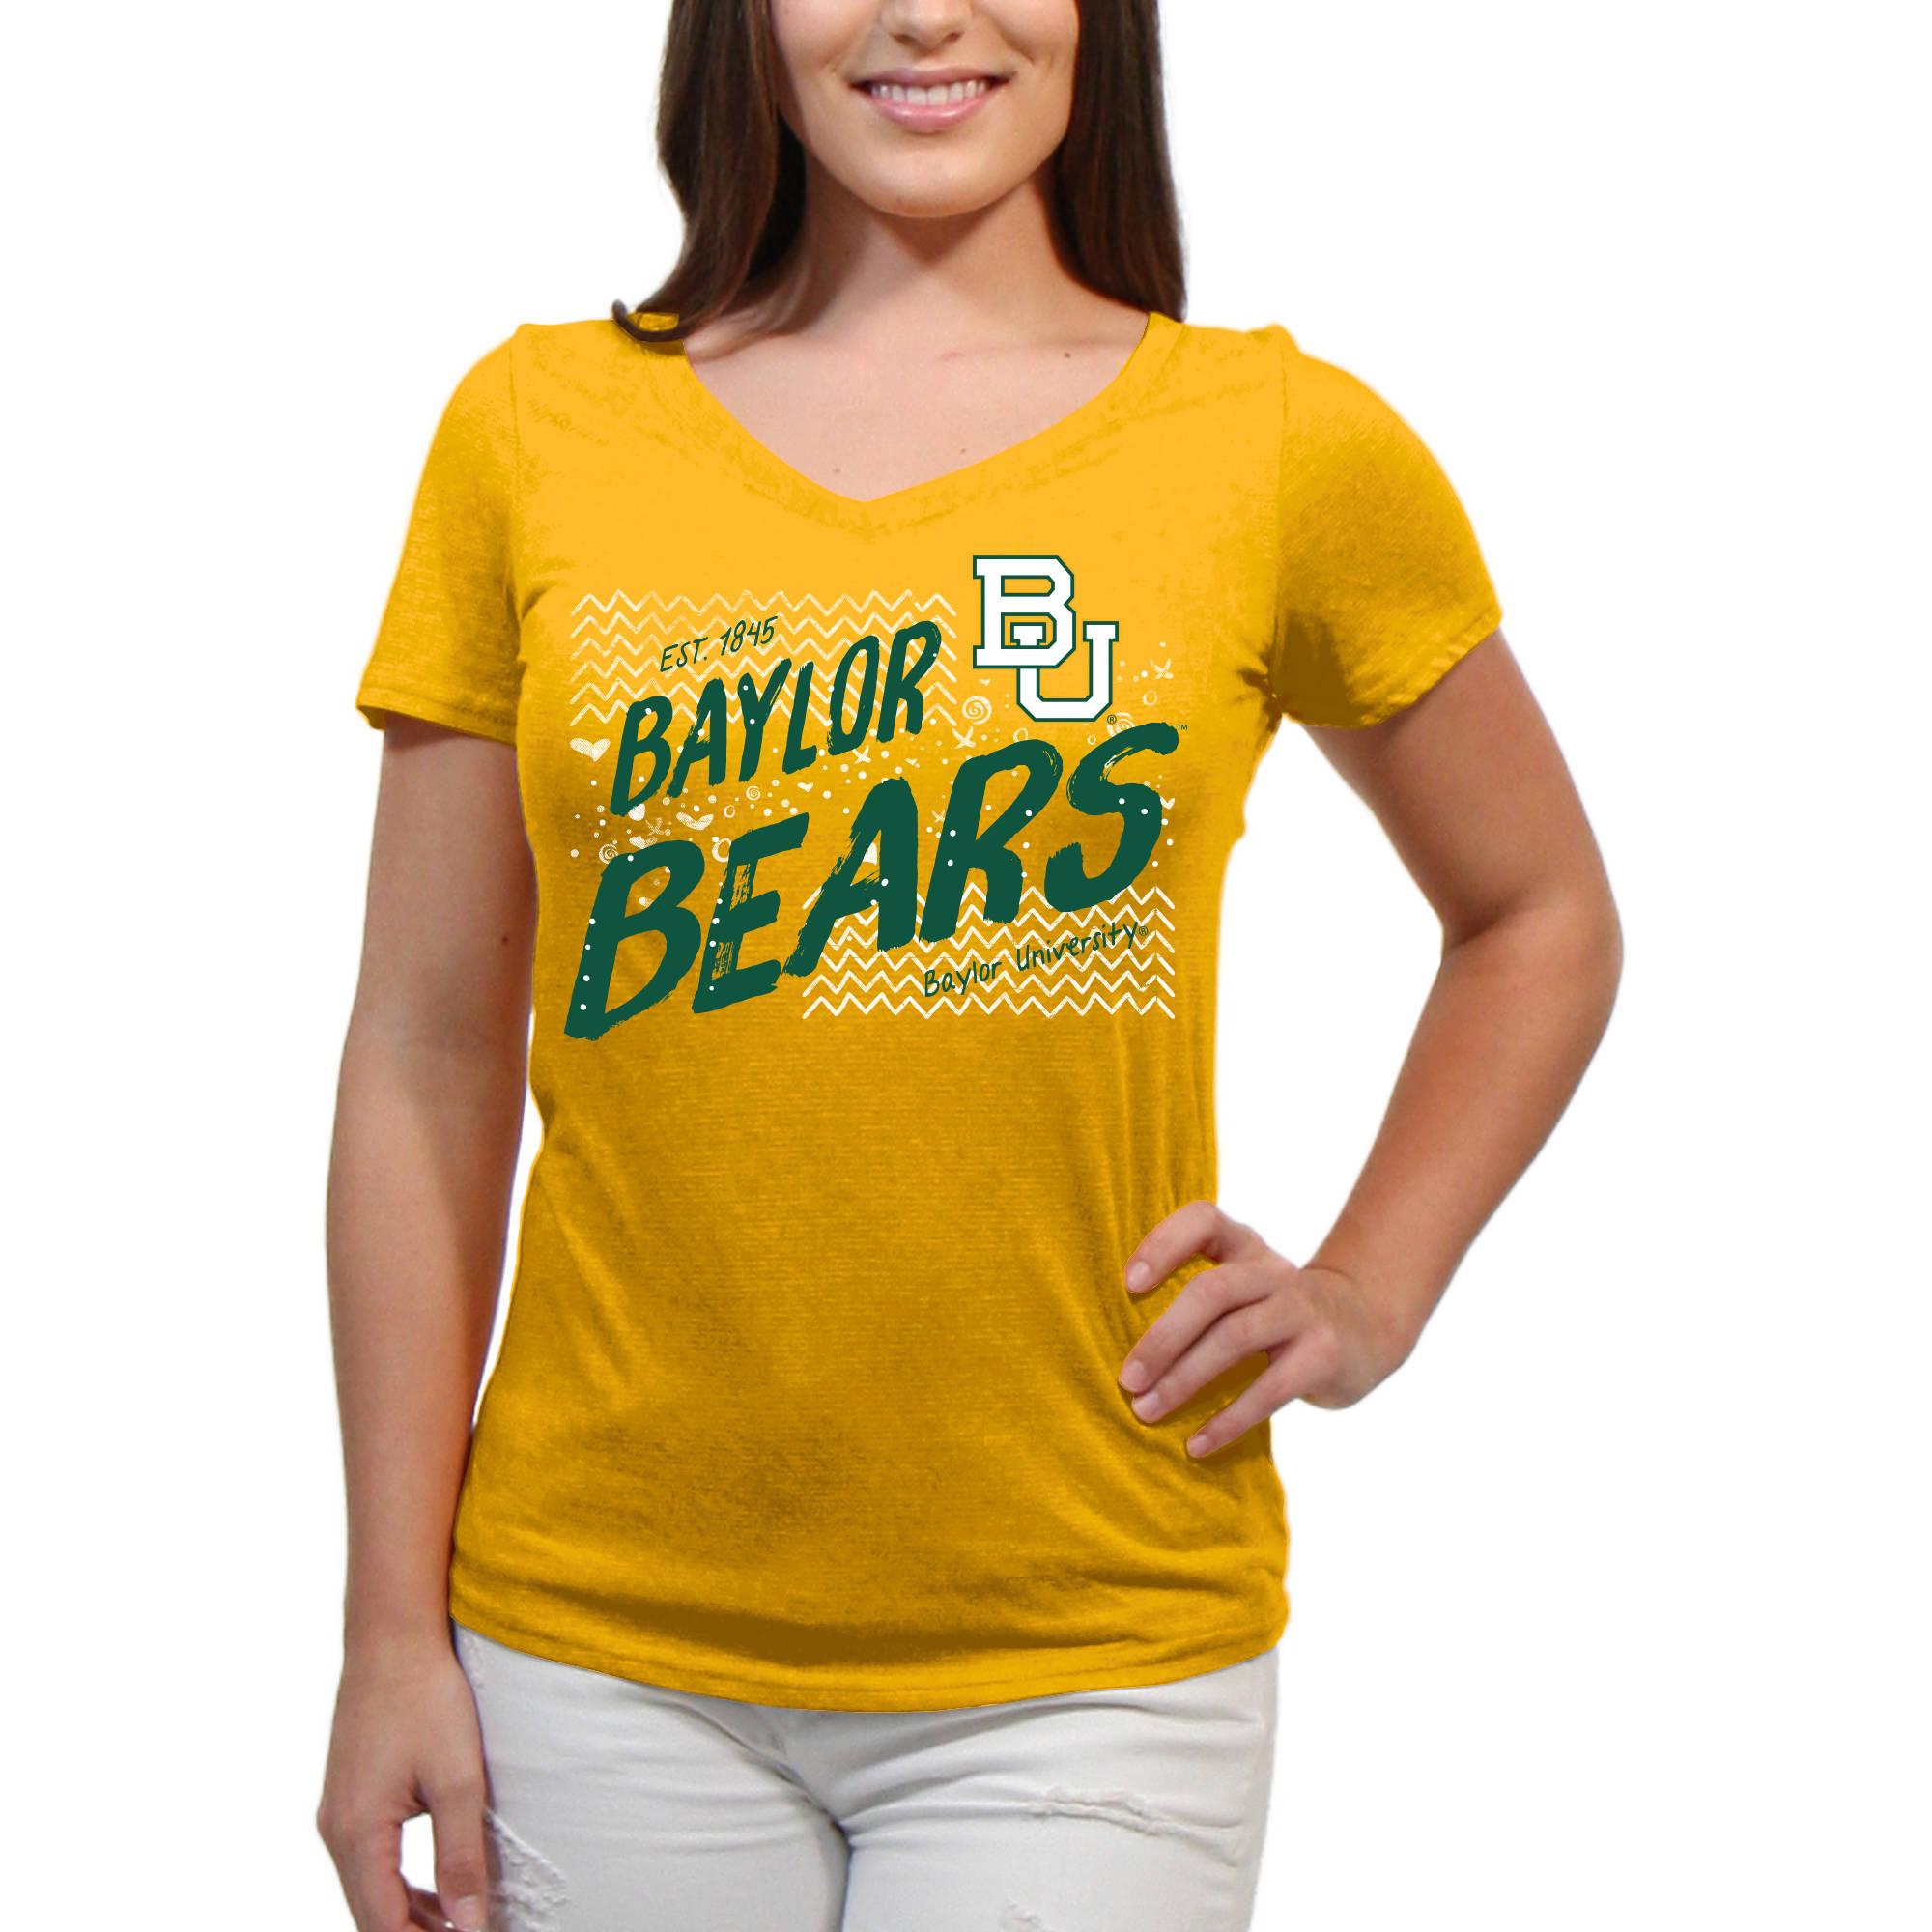 Baylor Bears Scatter Doodle Women'S/Juniors Team Short Sleeve V Neck Tee Shirt